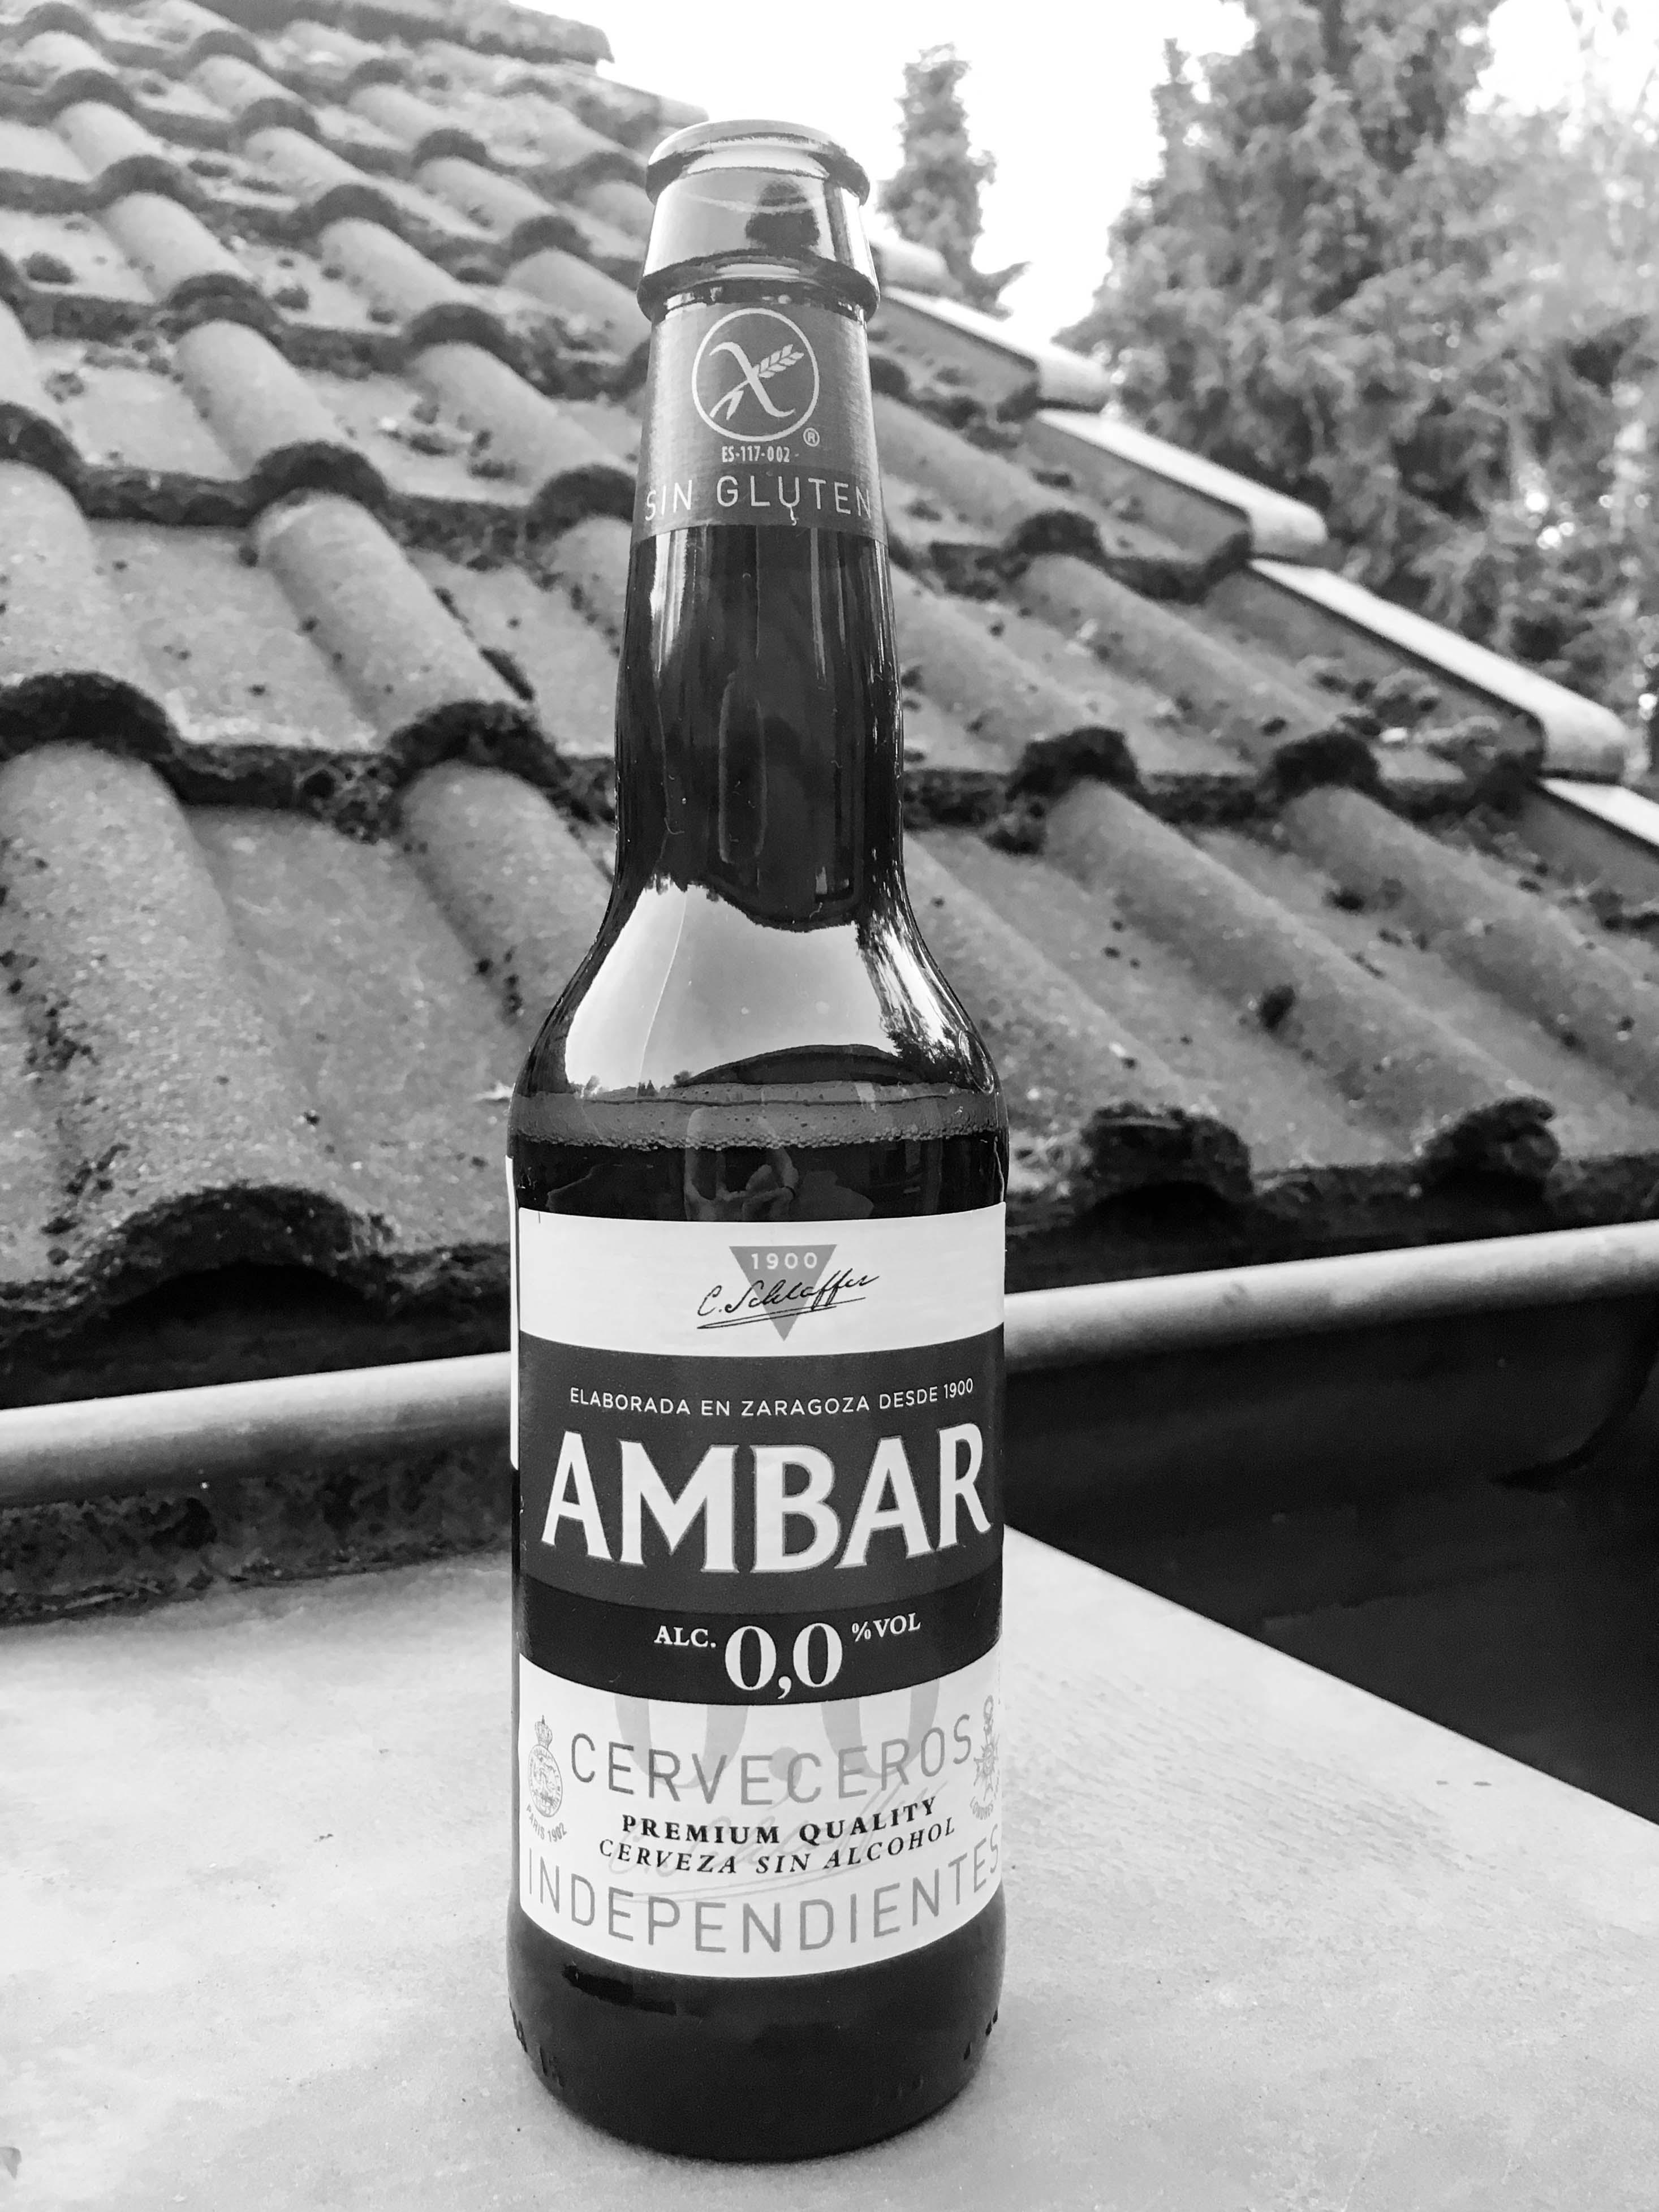 glutenfreies alkoholfreies spanisches Bier AMBAR